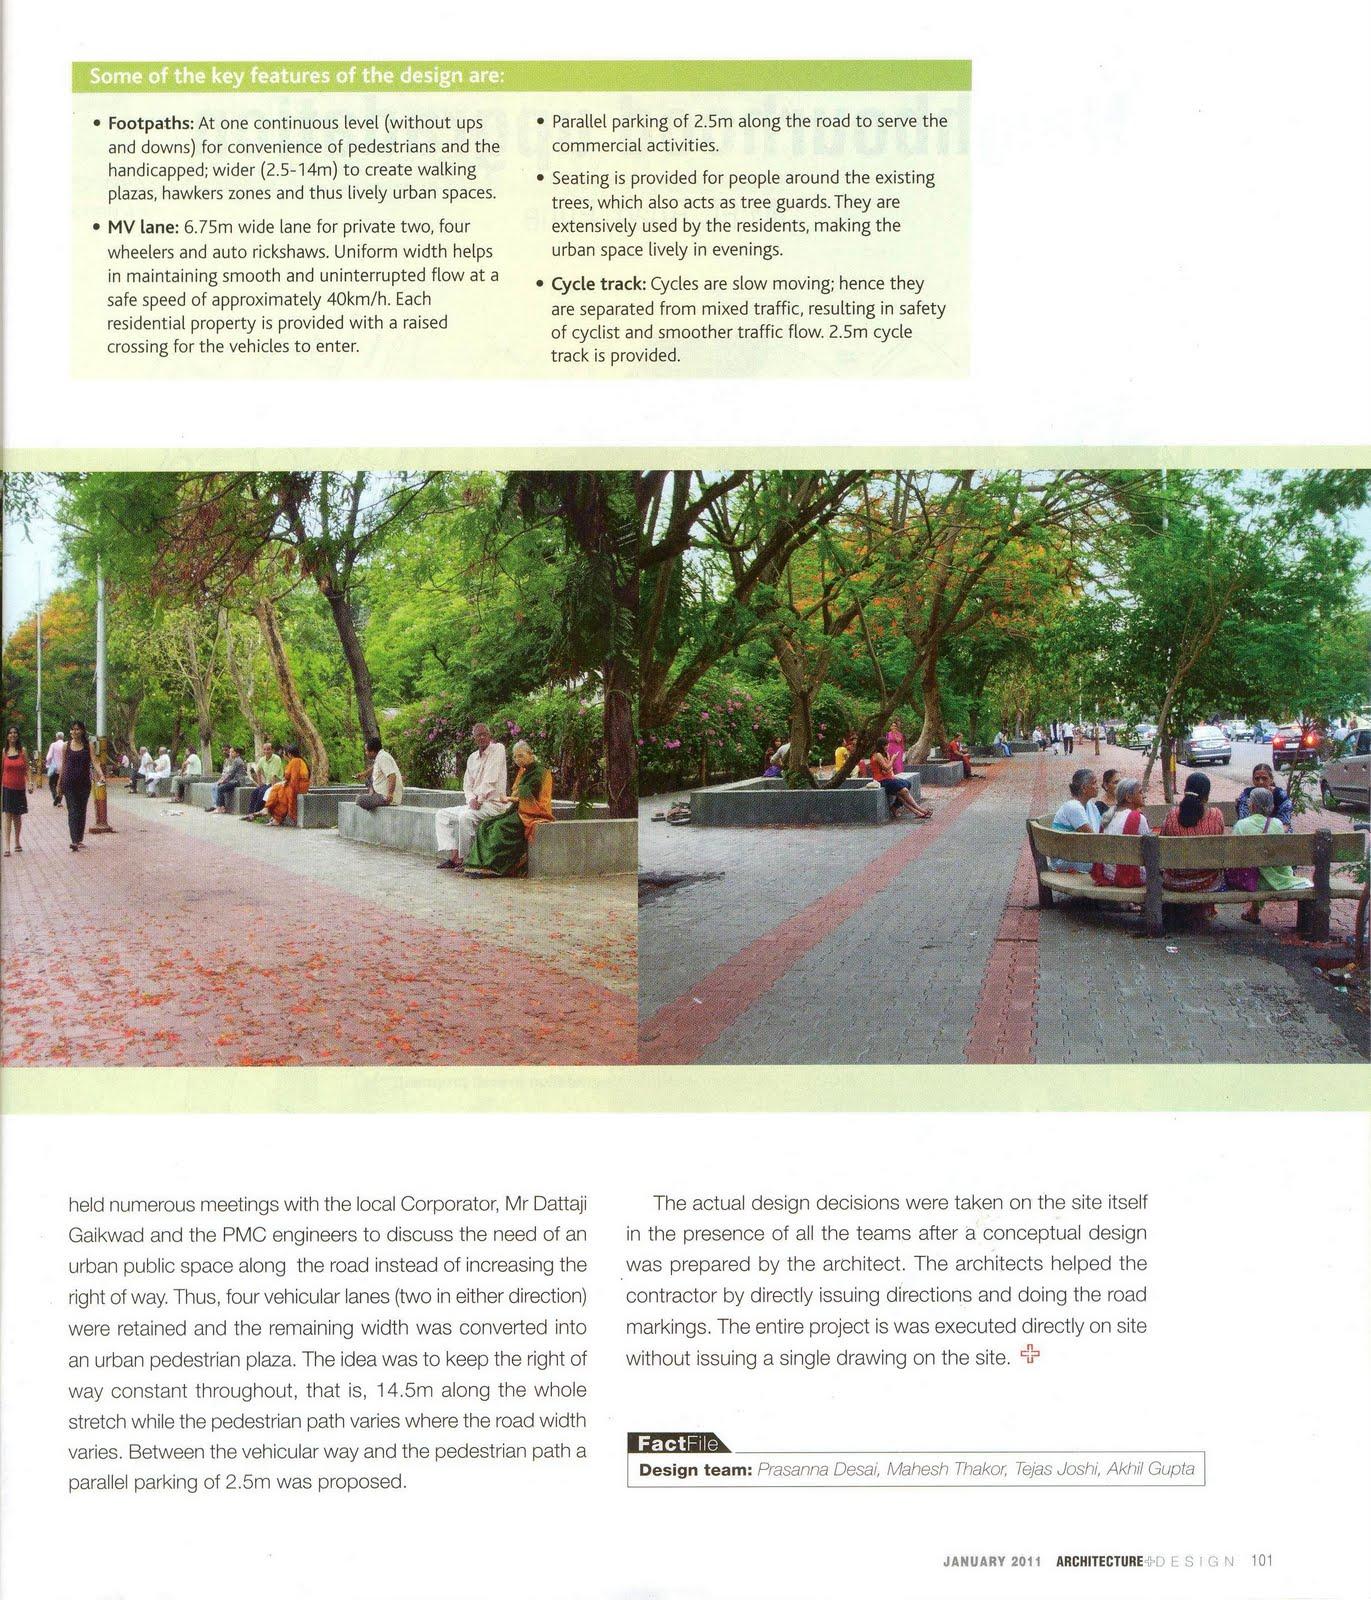 Prasanna desai architects works in public domain 2 for Architecture firms for internship in pune